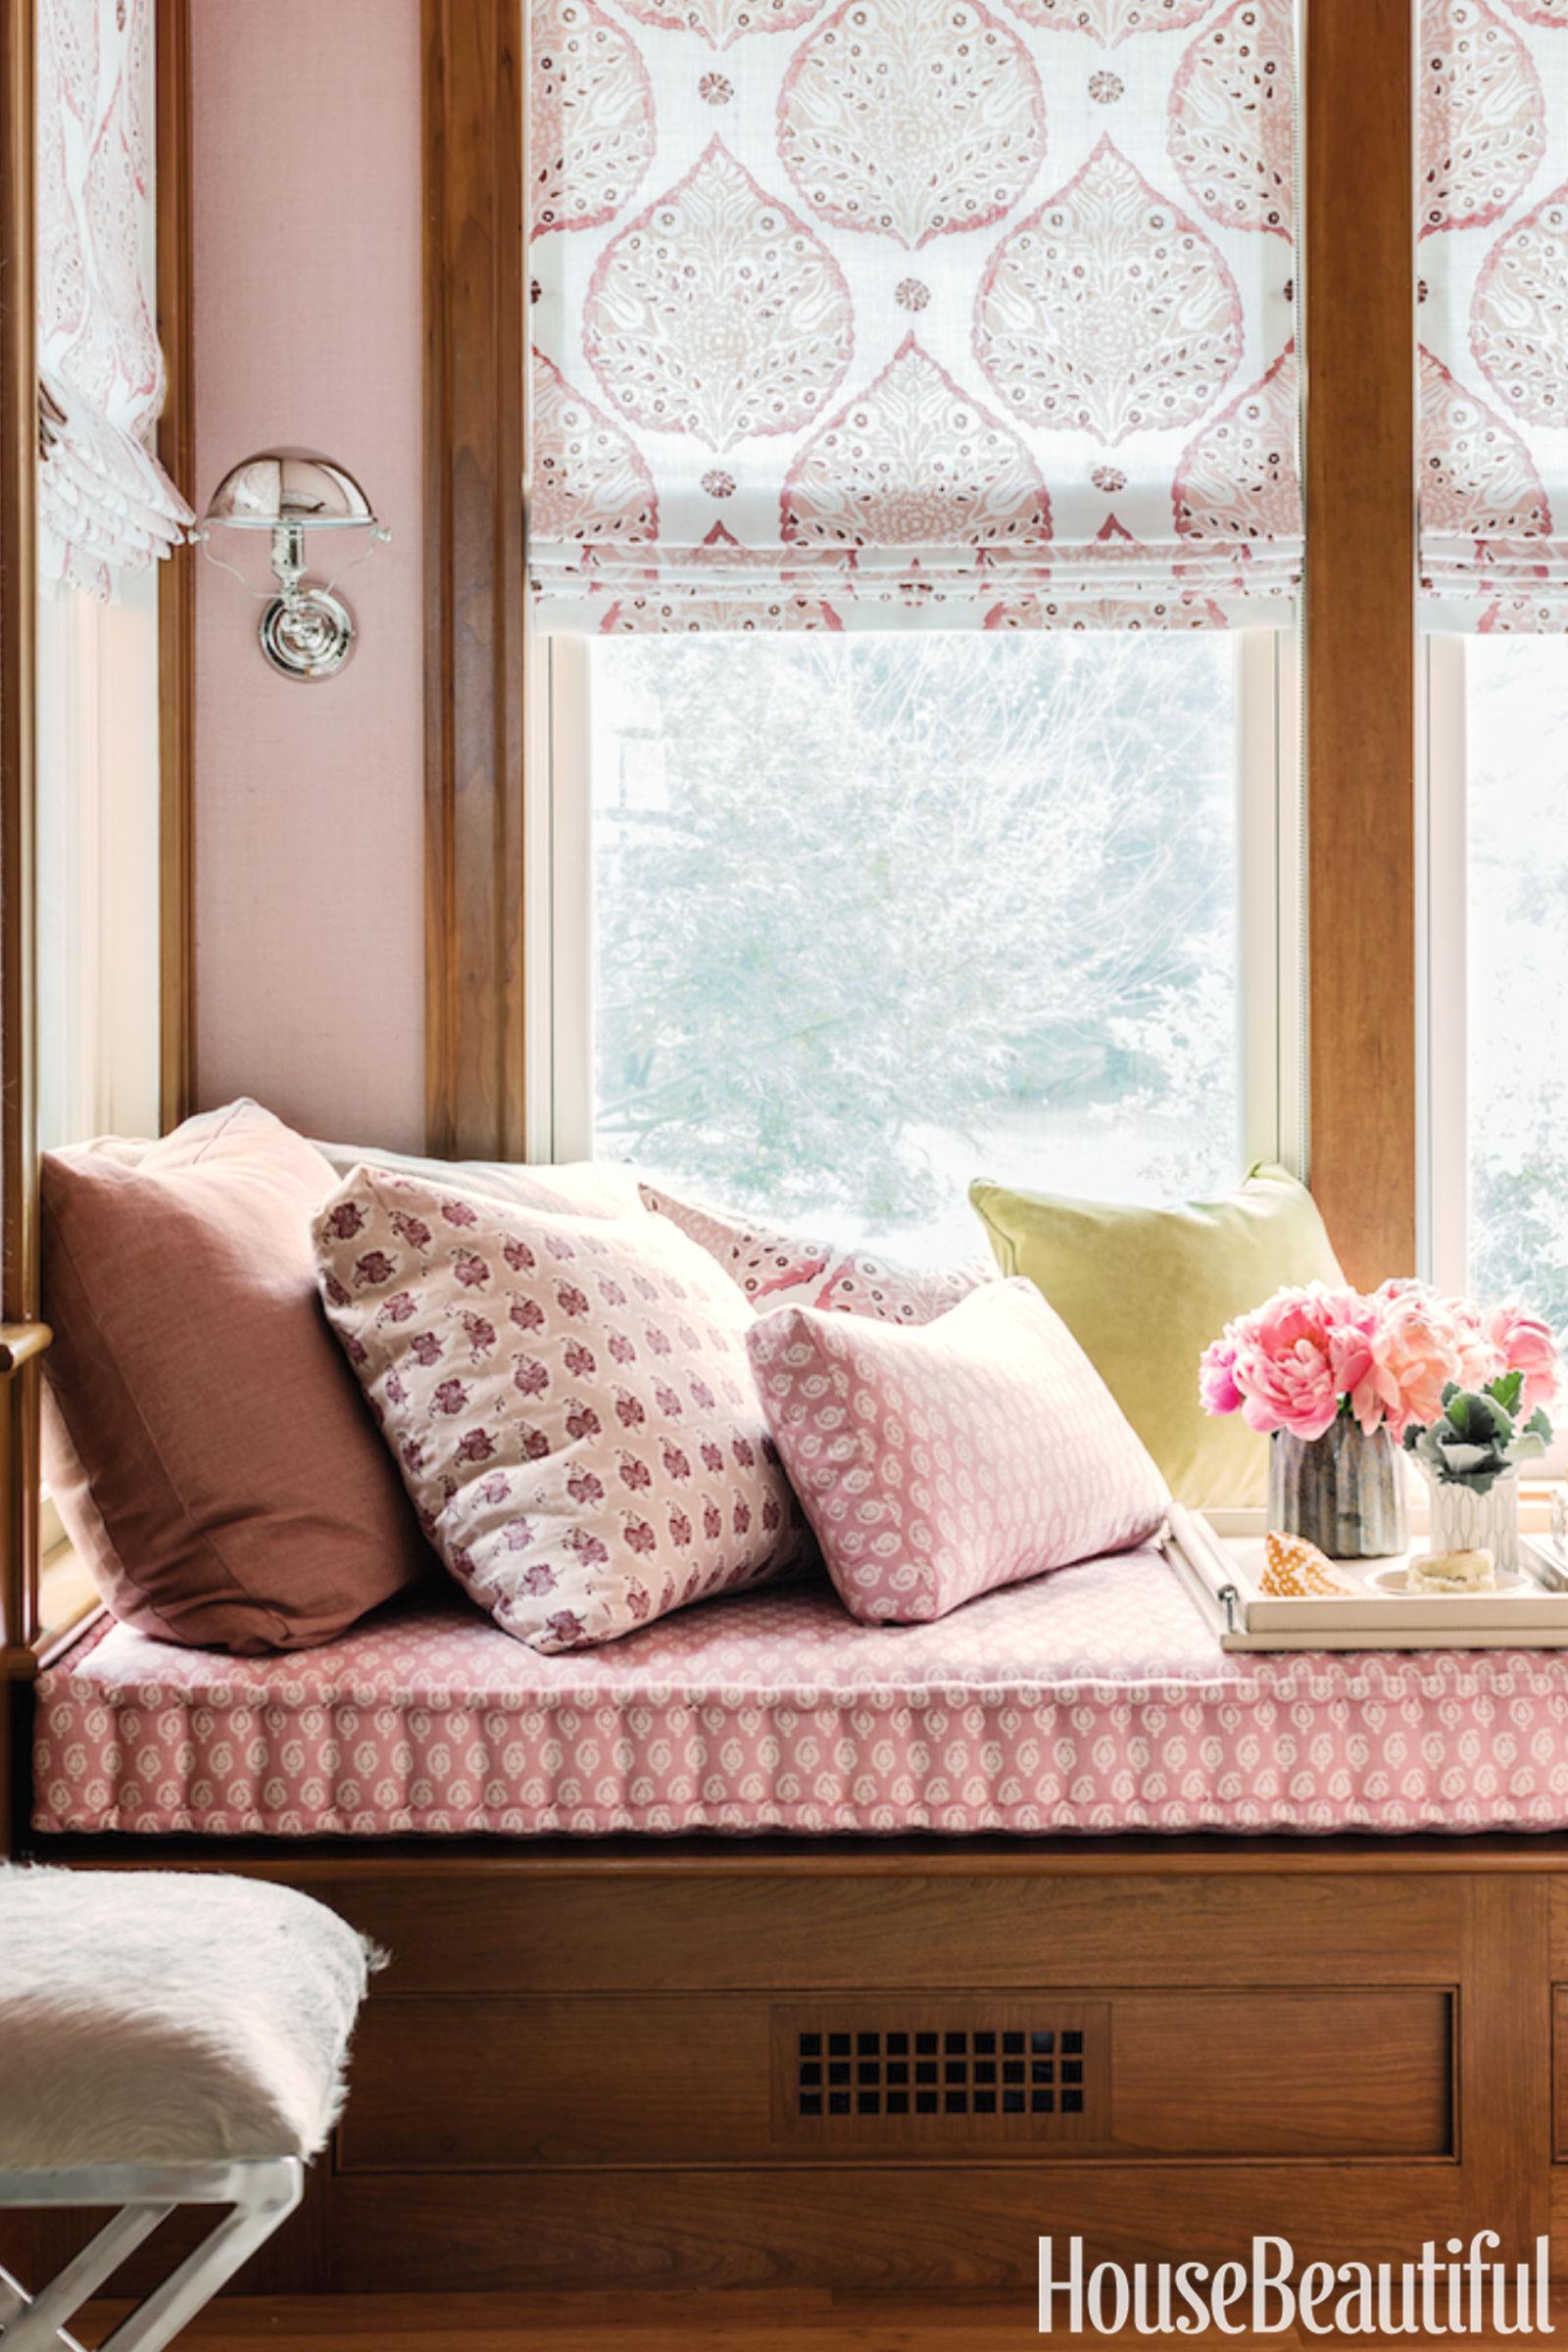 Science Wallpaper Bedroom 2017 Color Trends Interior Designer Paint Color Predictions For